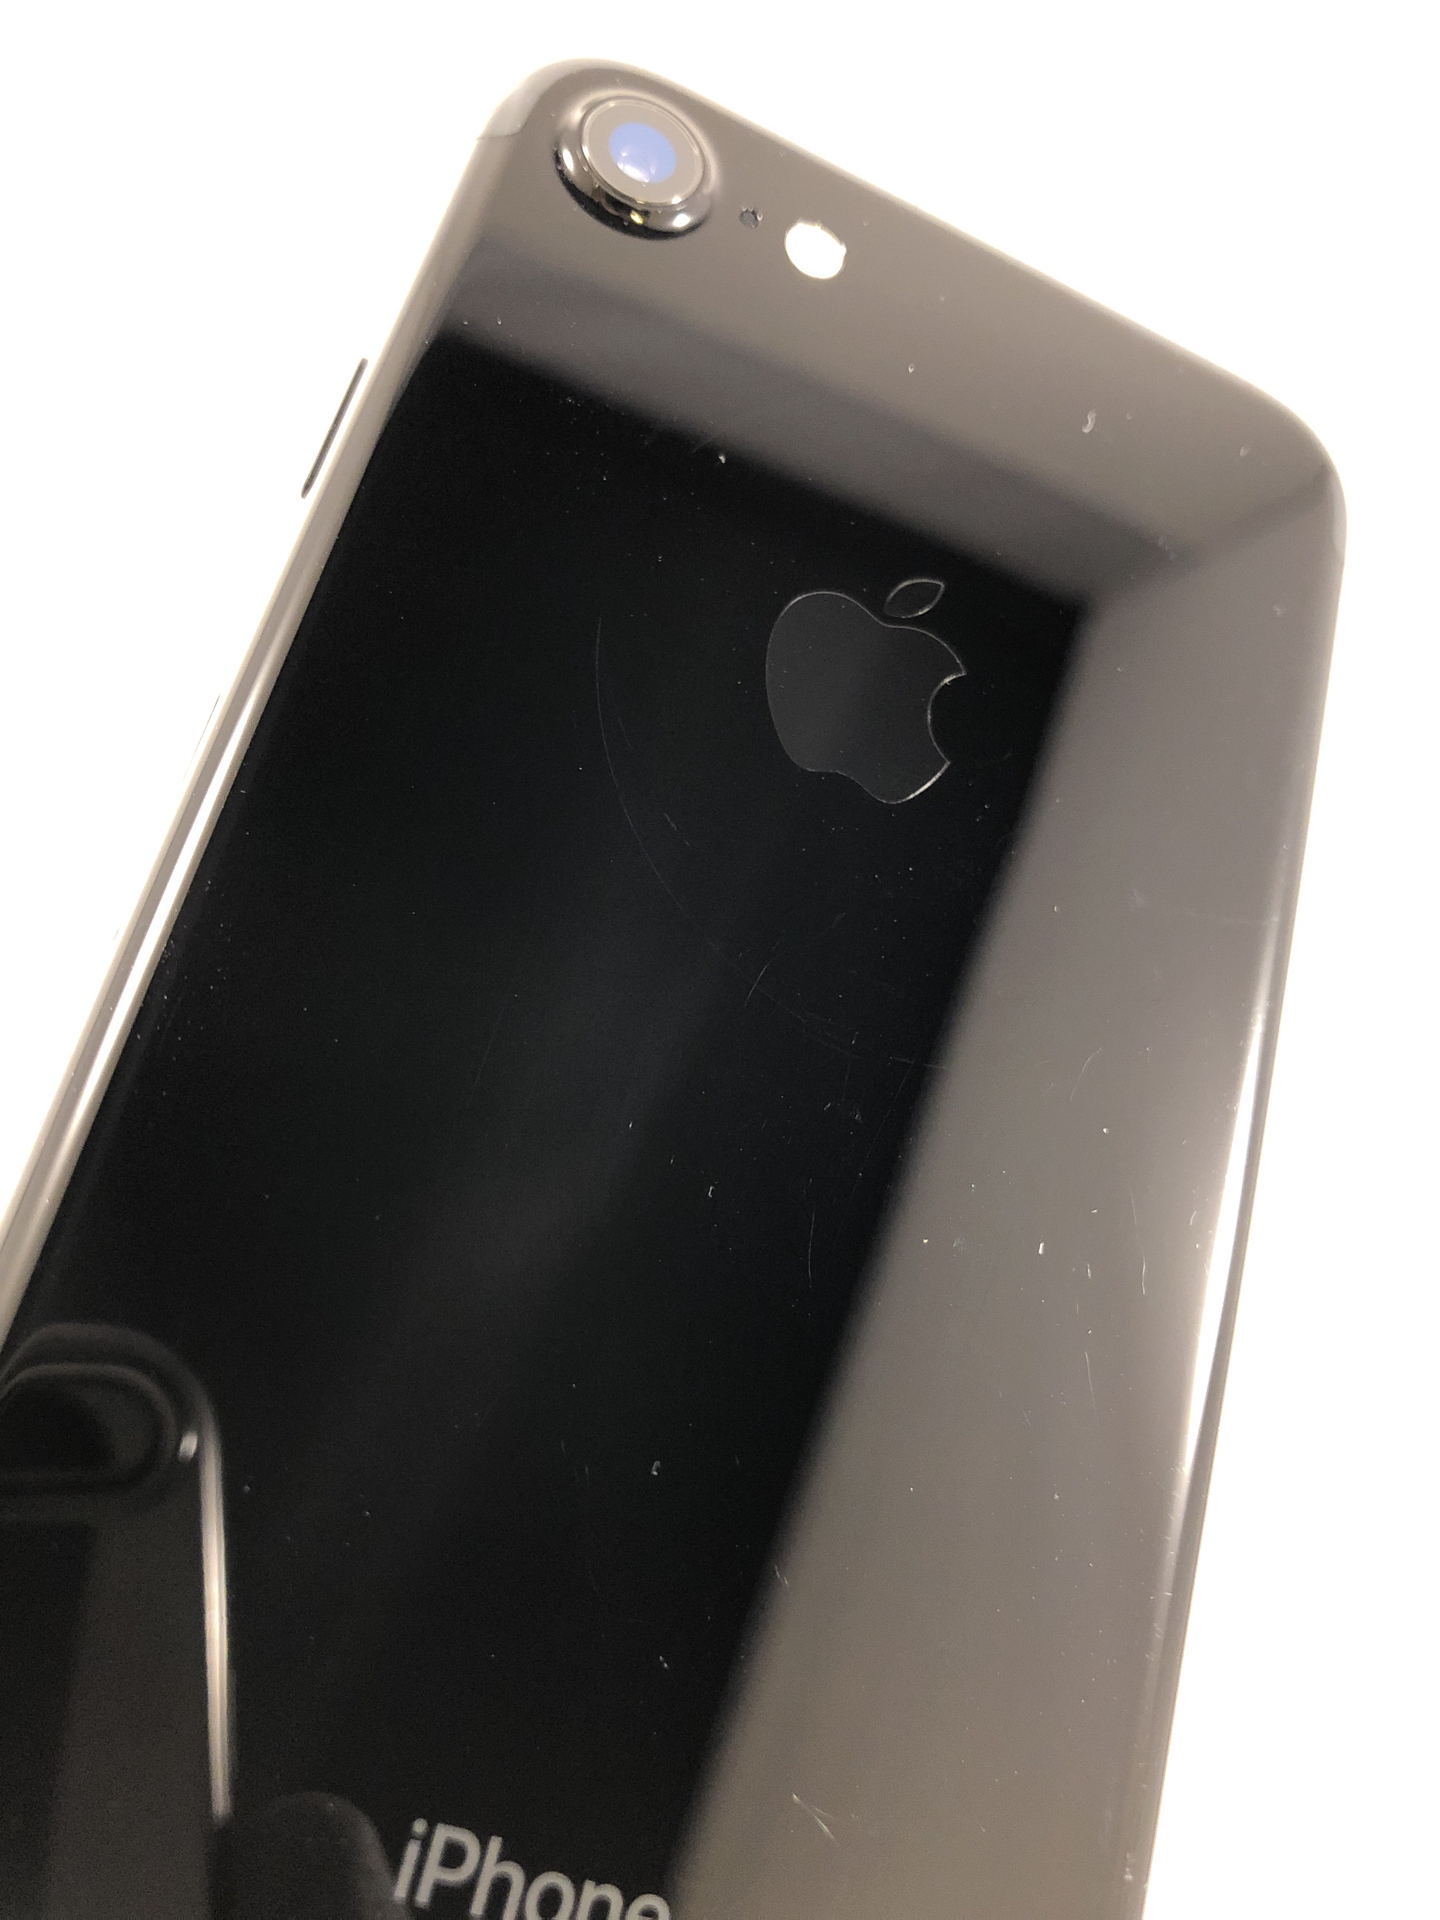 iPhone 7 256GB, 256GB, Jet Black, bild 5